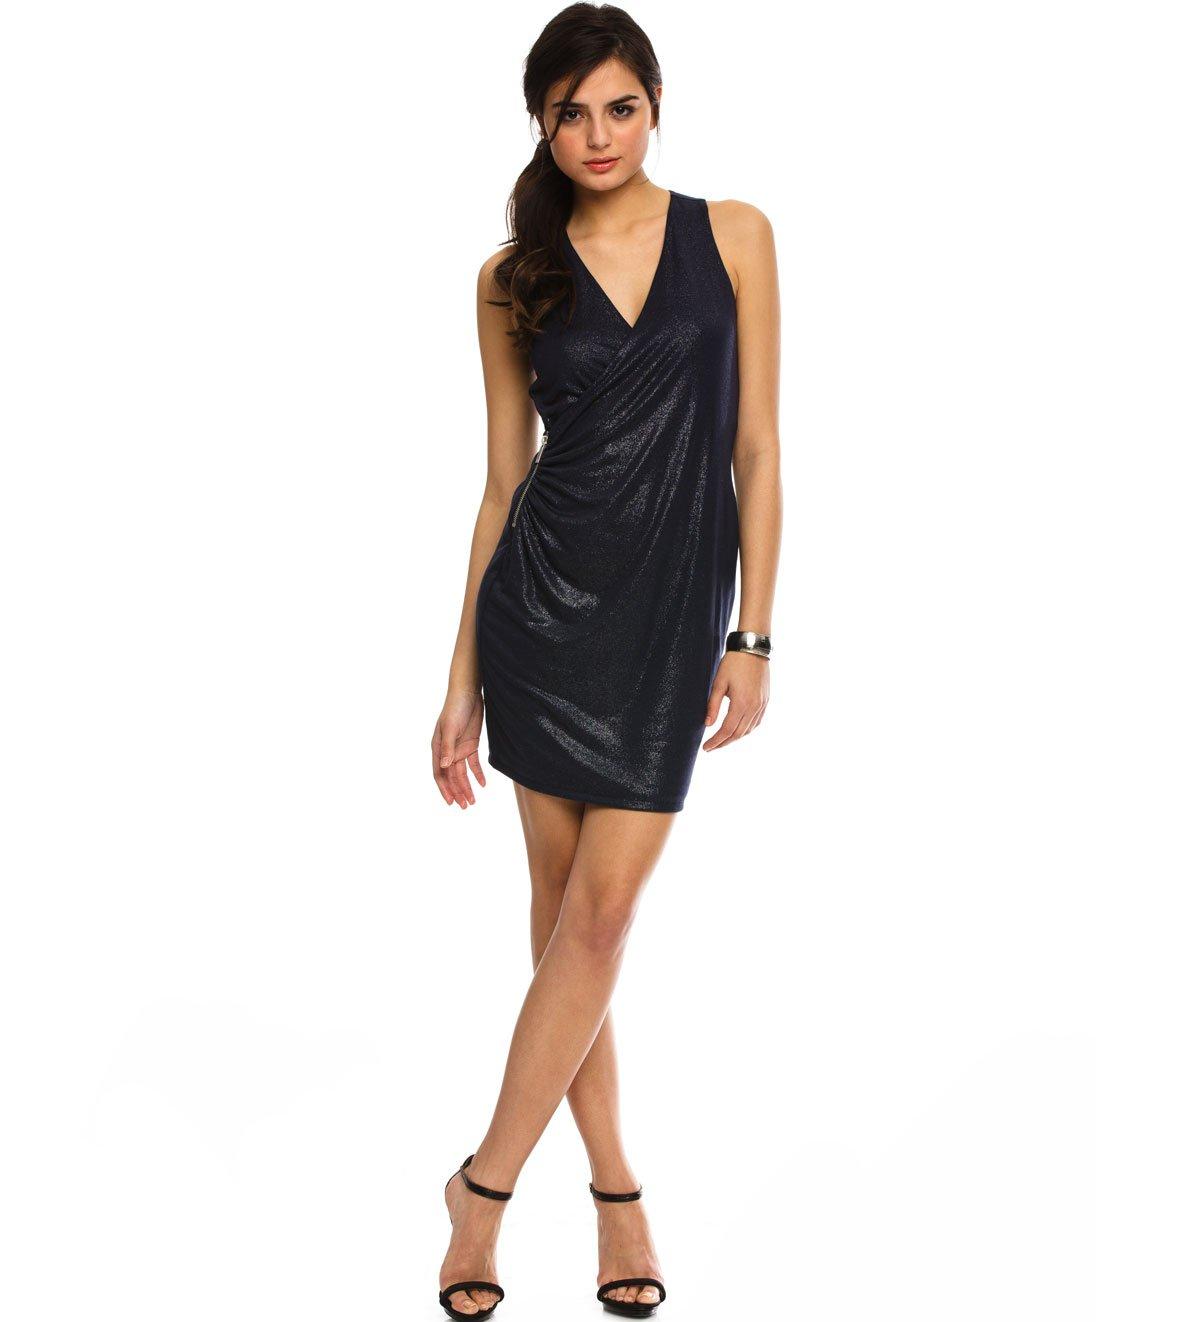 Armani Exchange 阿玛尼时尚连衣裙 29美元